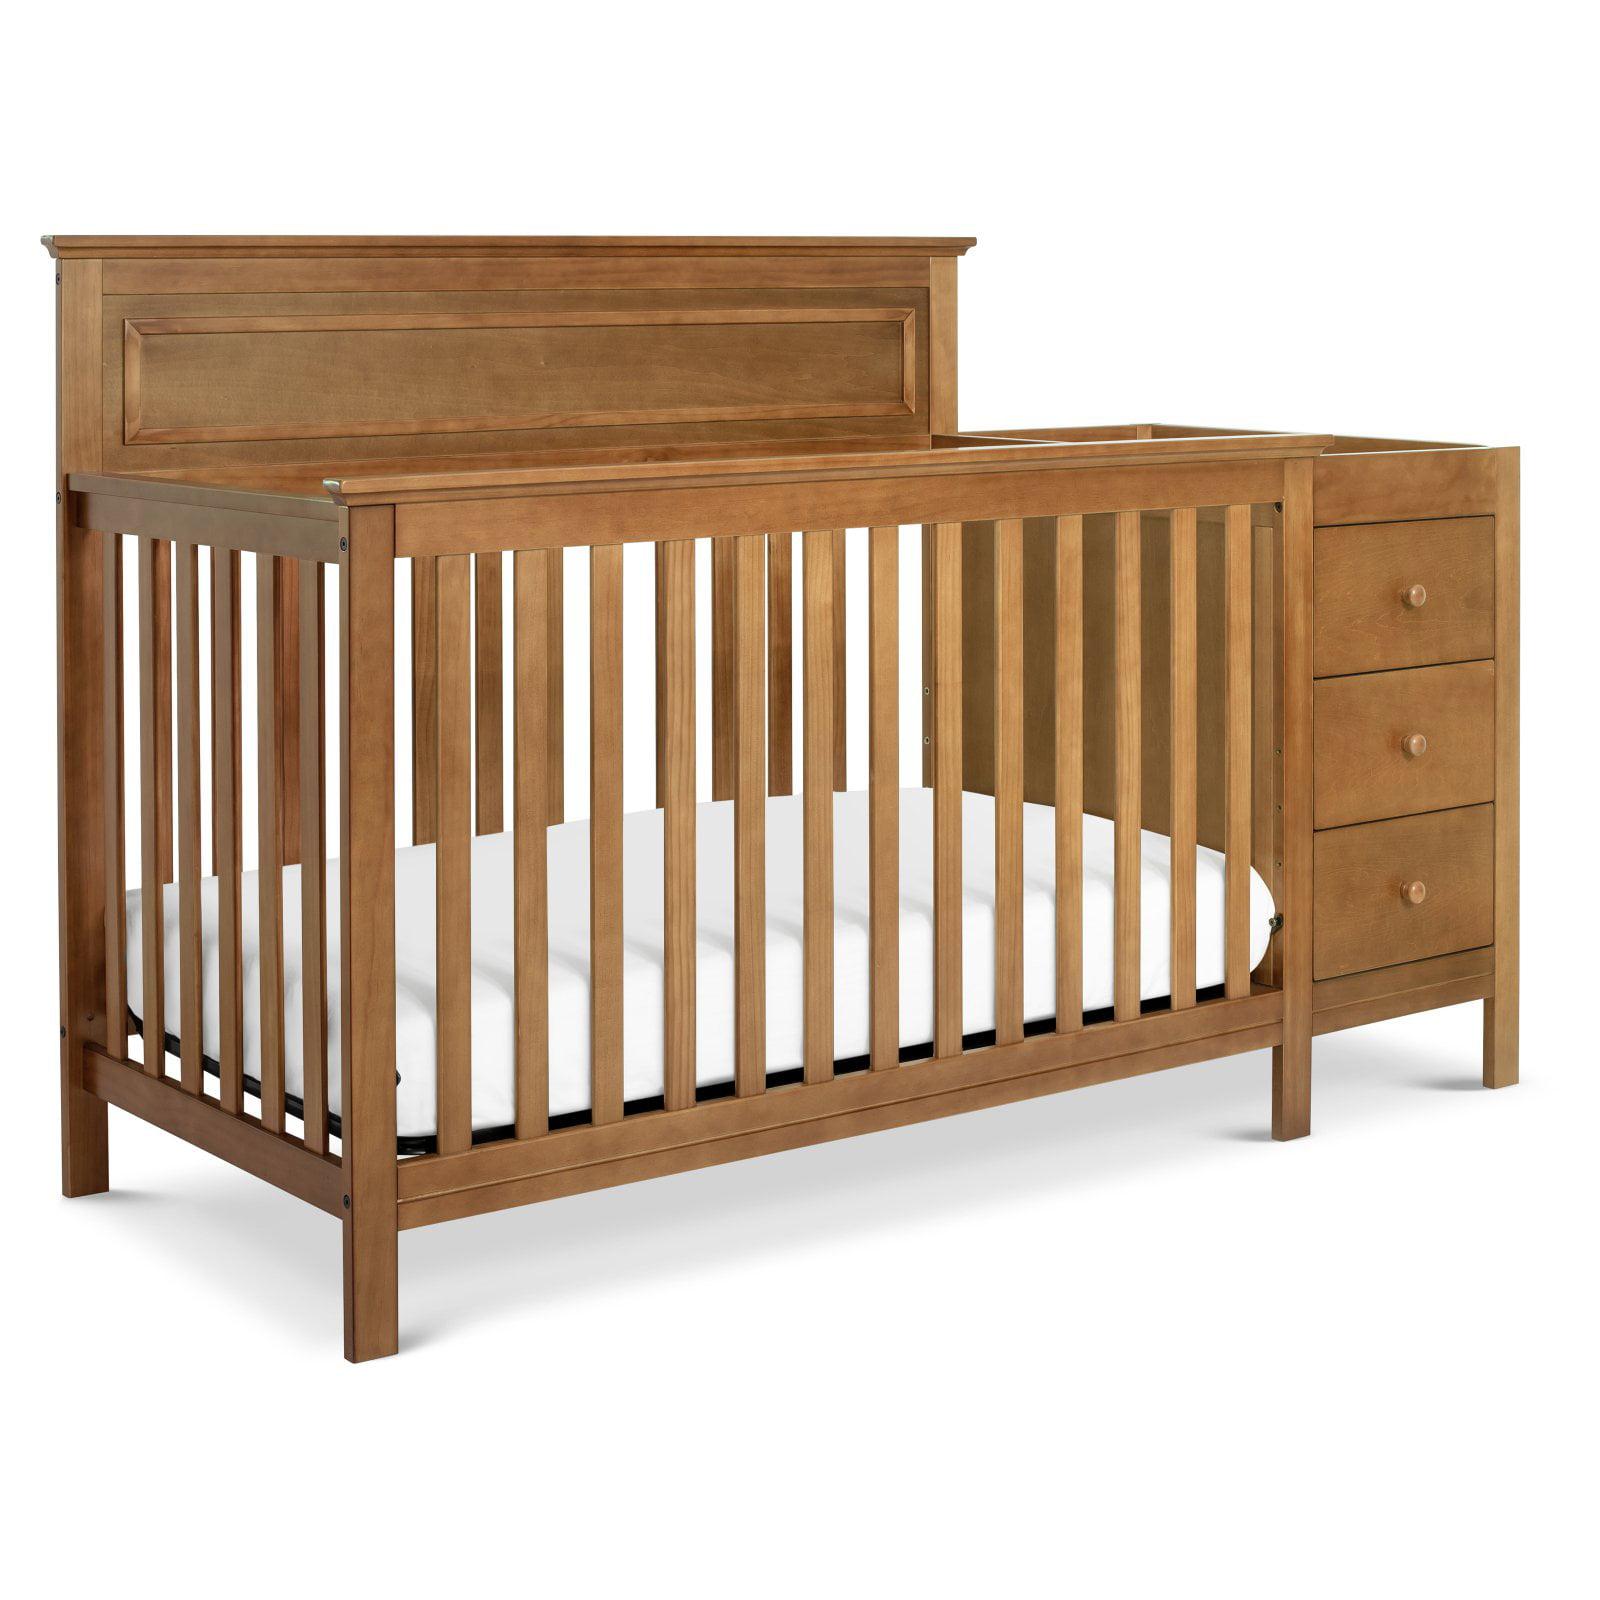 Davinci Autumn 4 In 1 Convertible Crib And Changer Combo